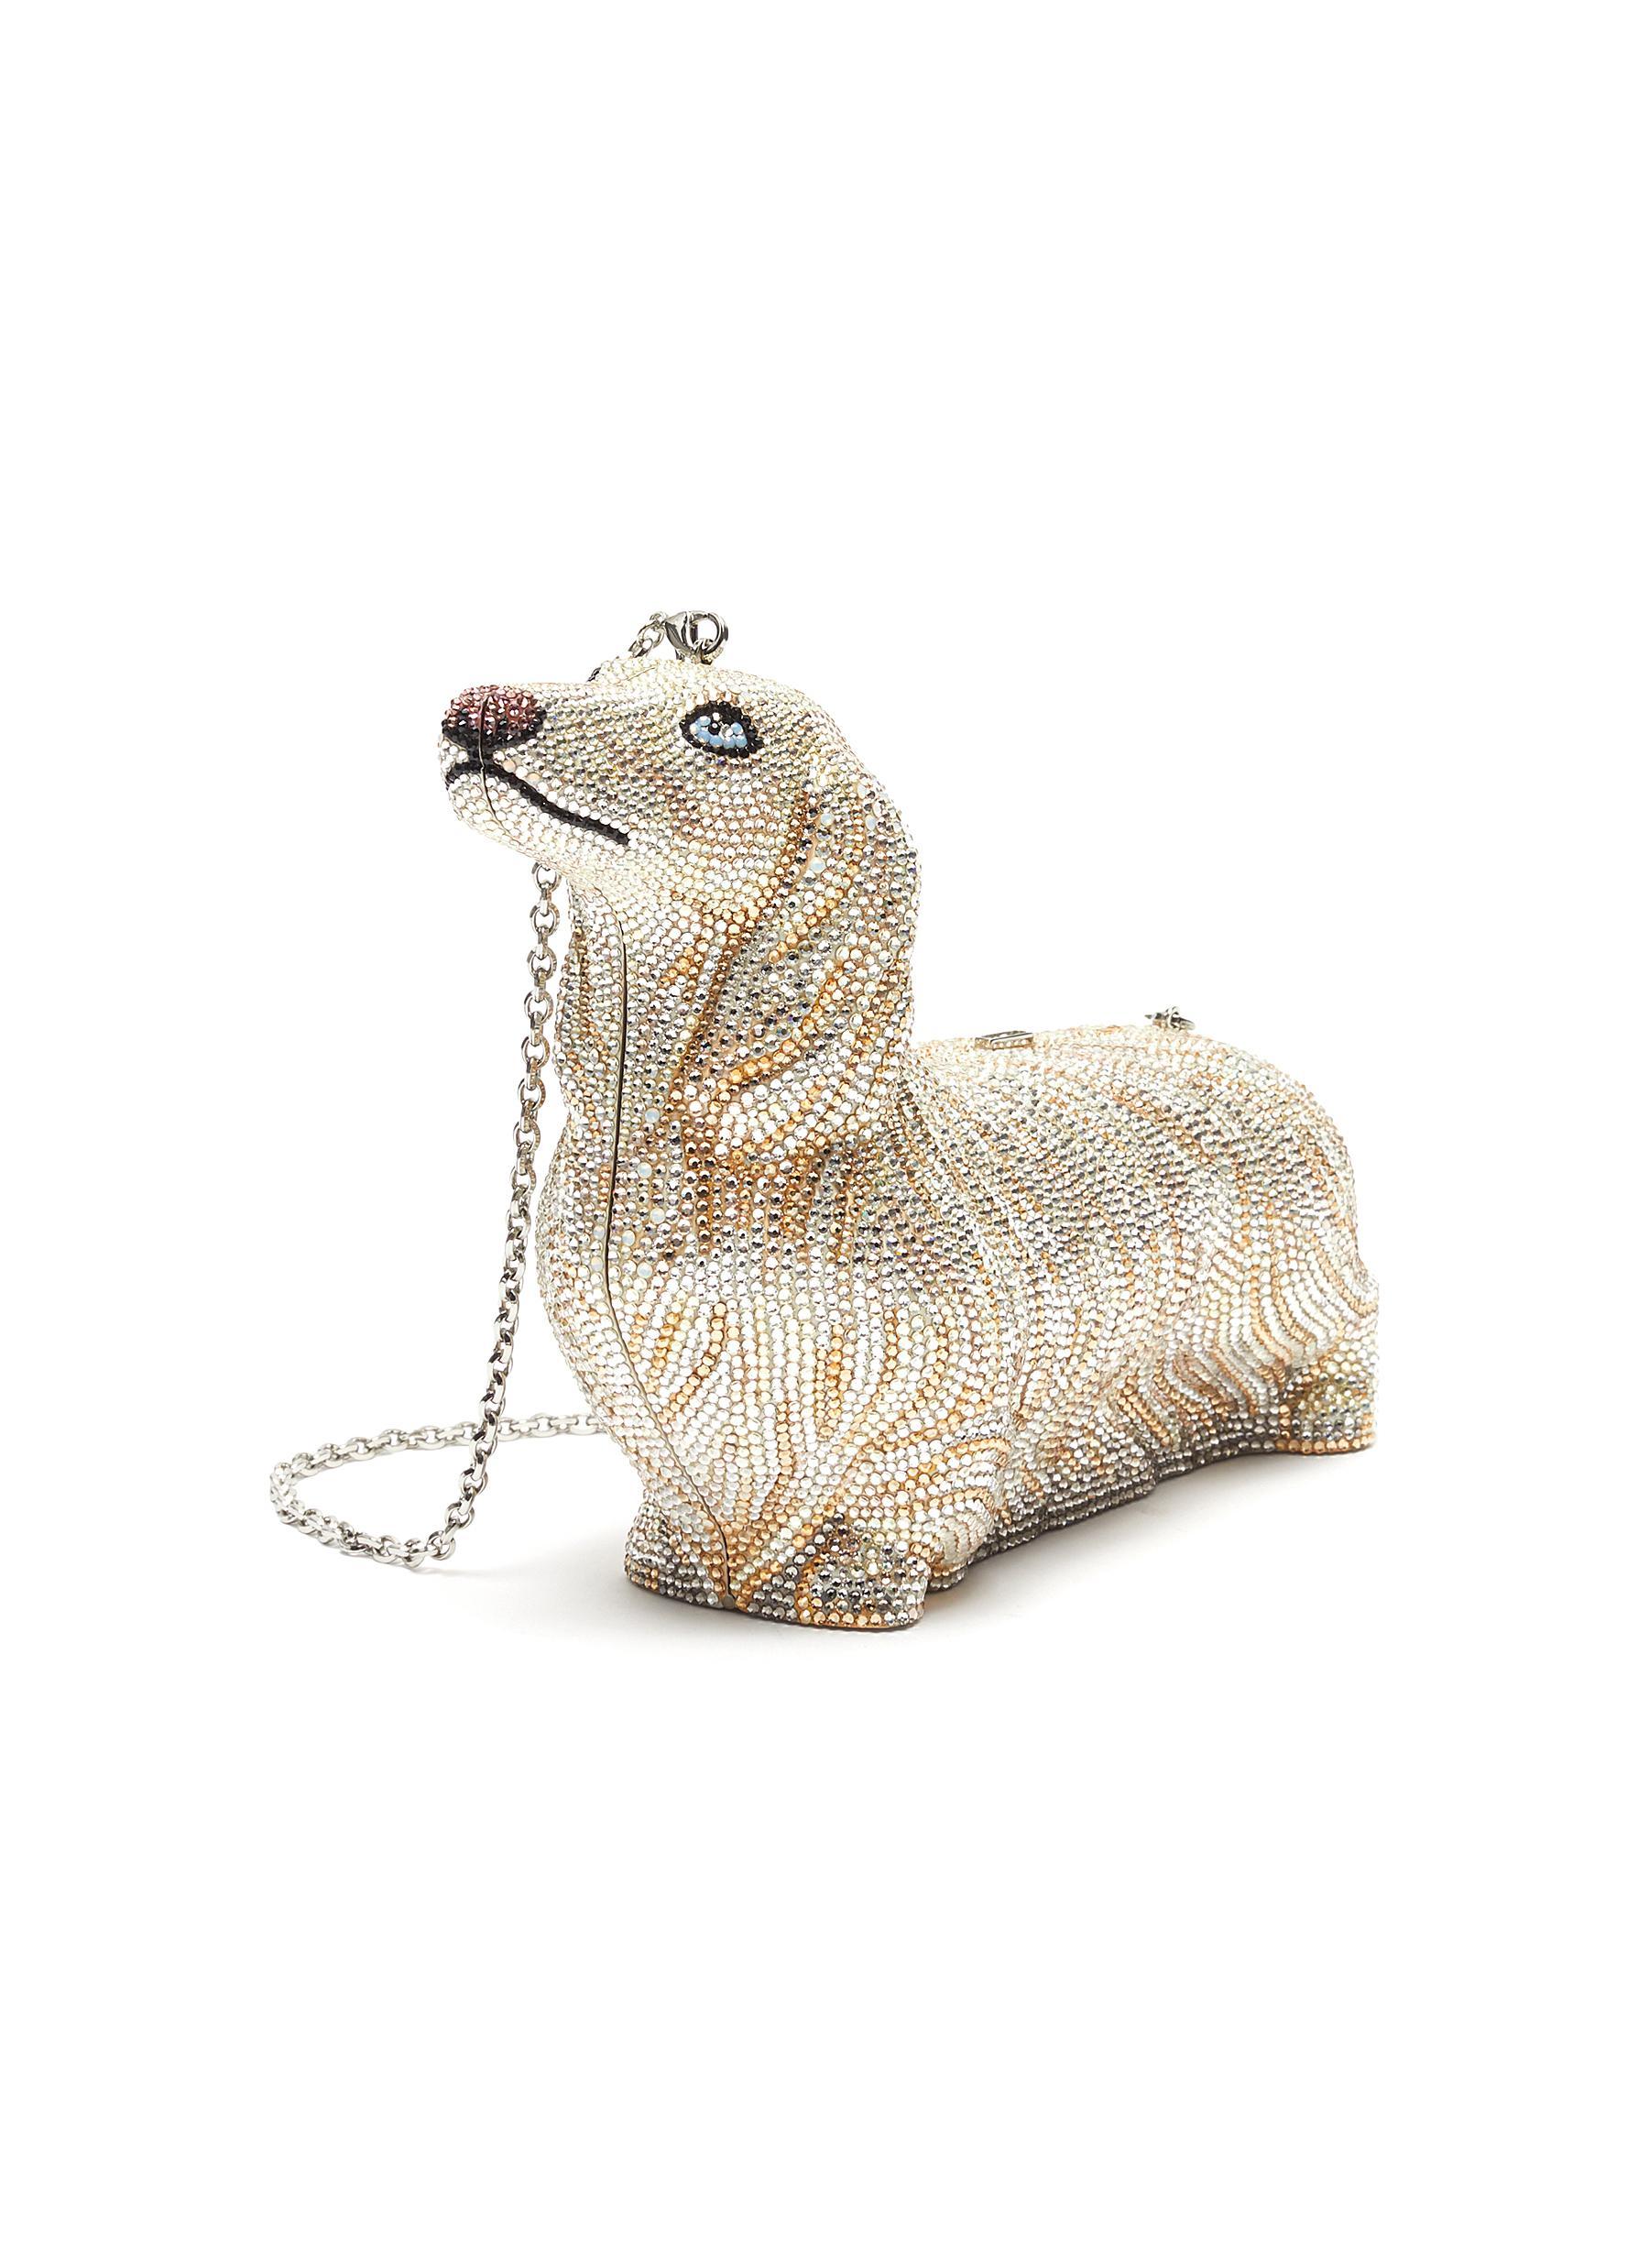 Blondie Dachshund' Embellished Bag